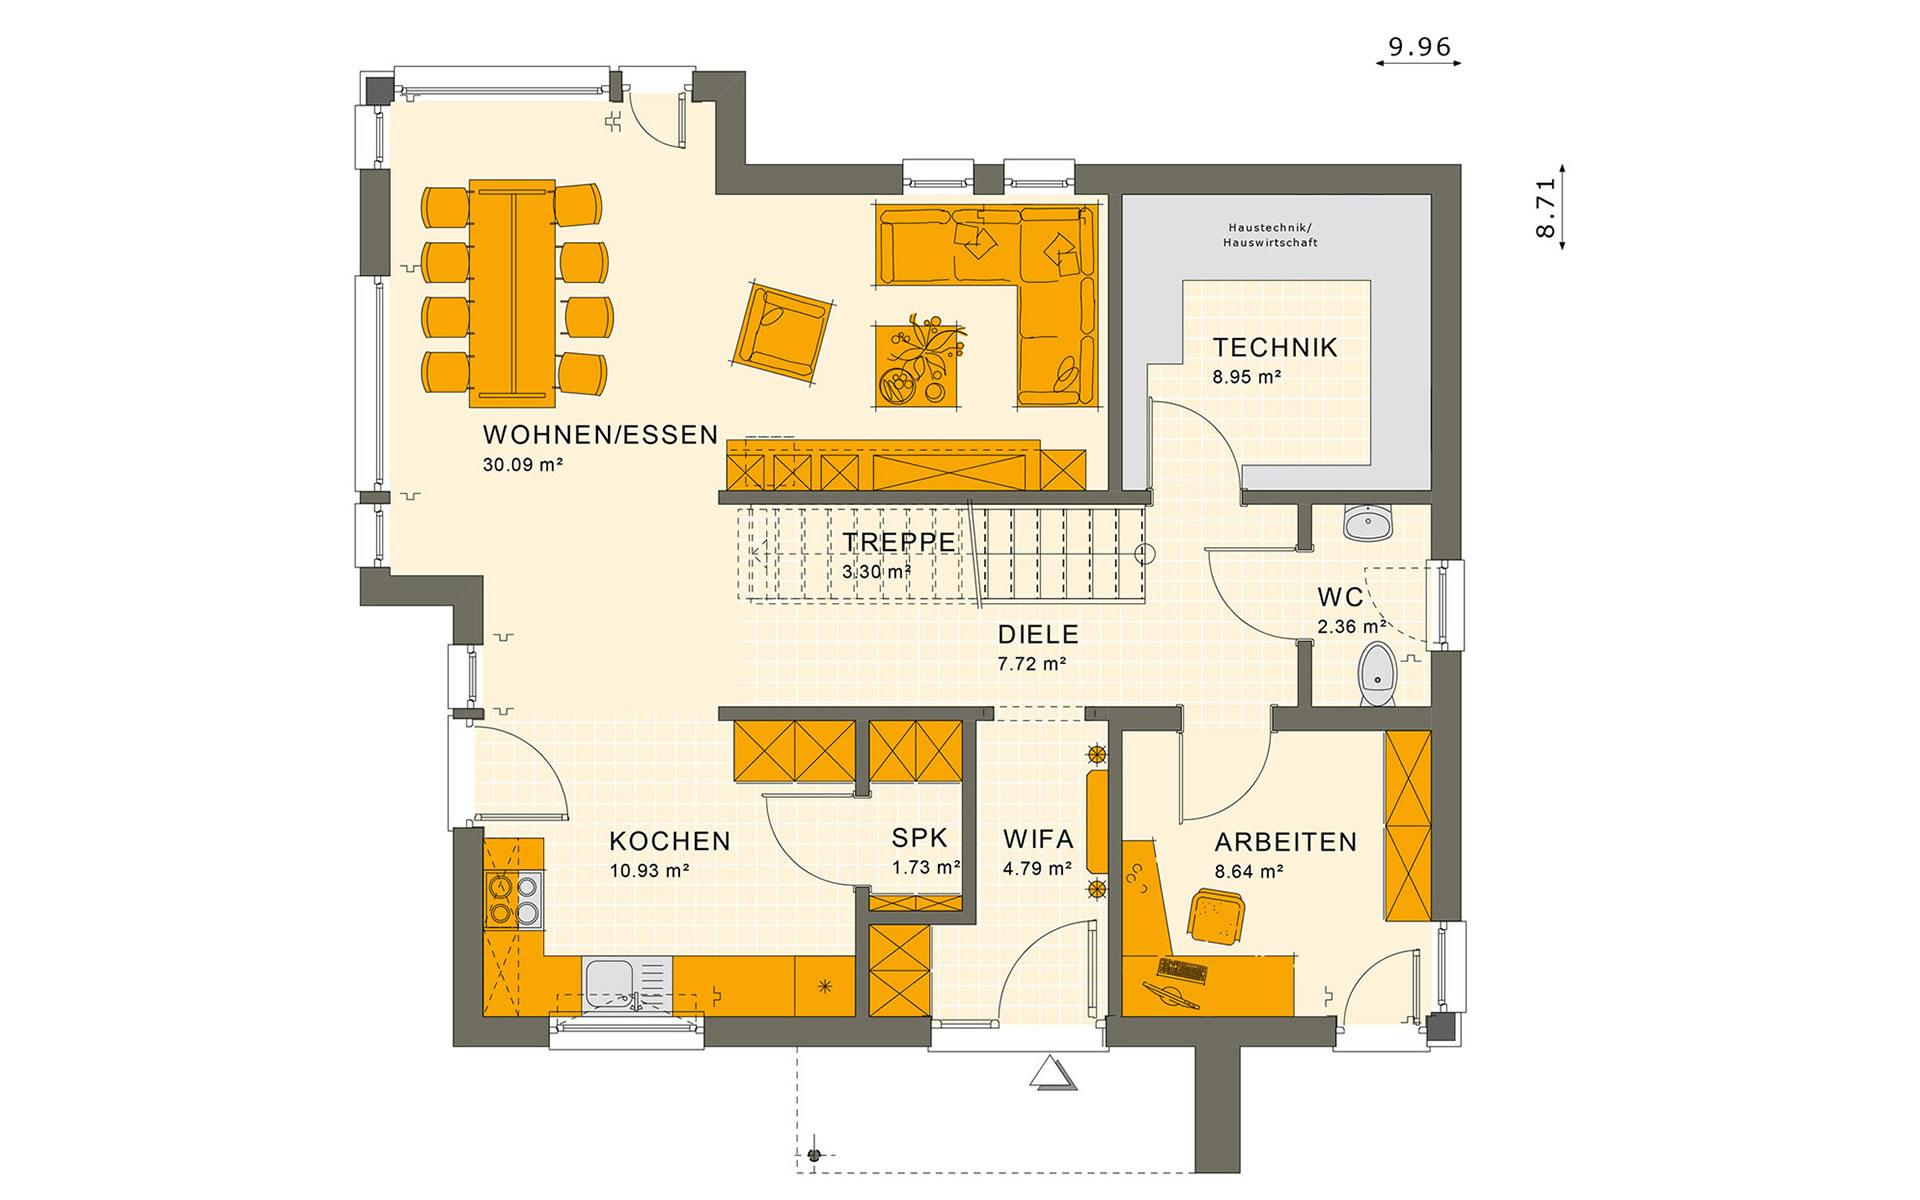 Erdgeschoss SUNSHINE 144 V4 von Living Fertighaus GmbH